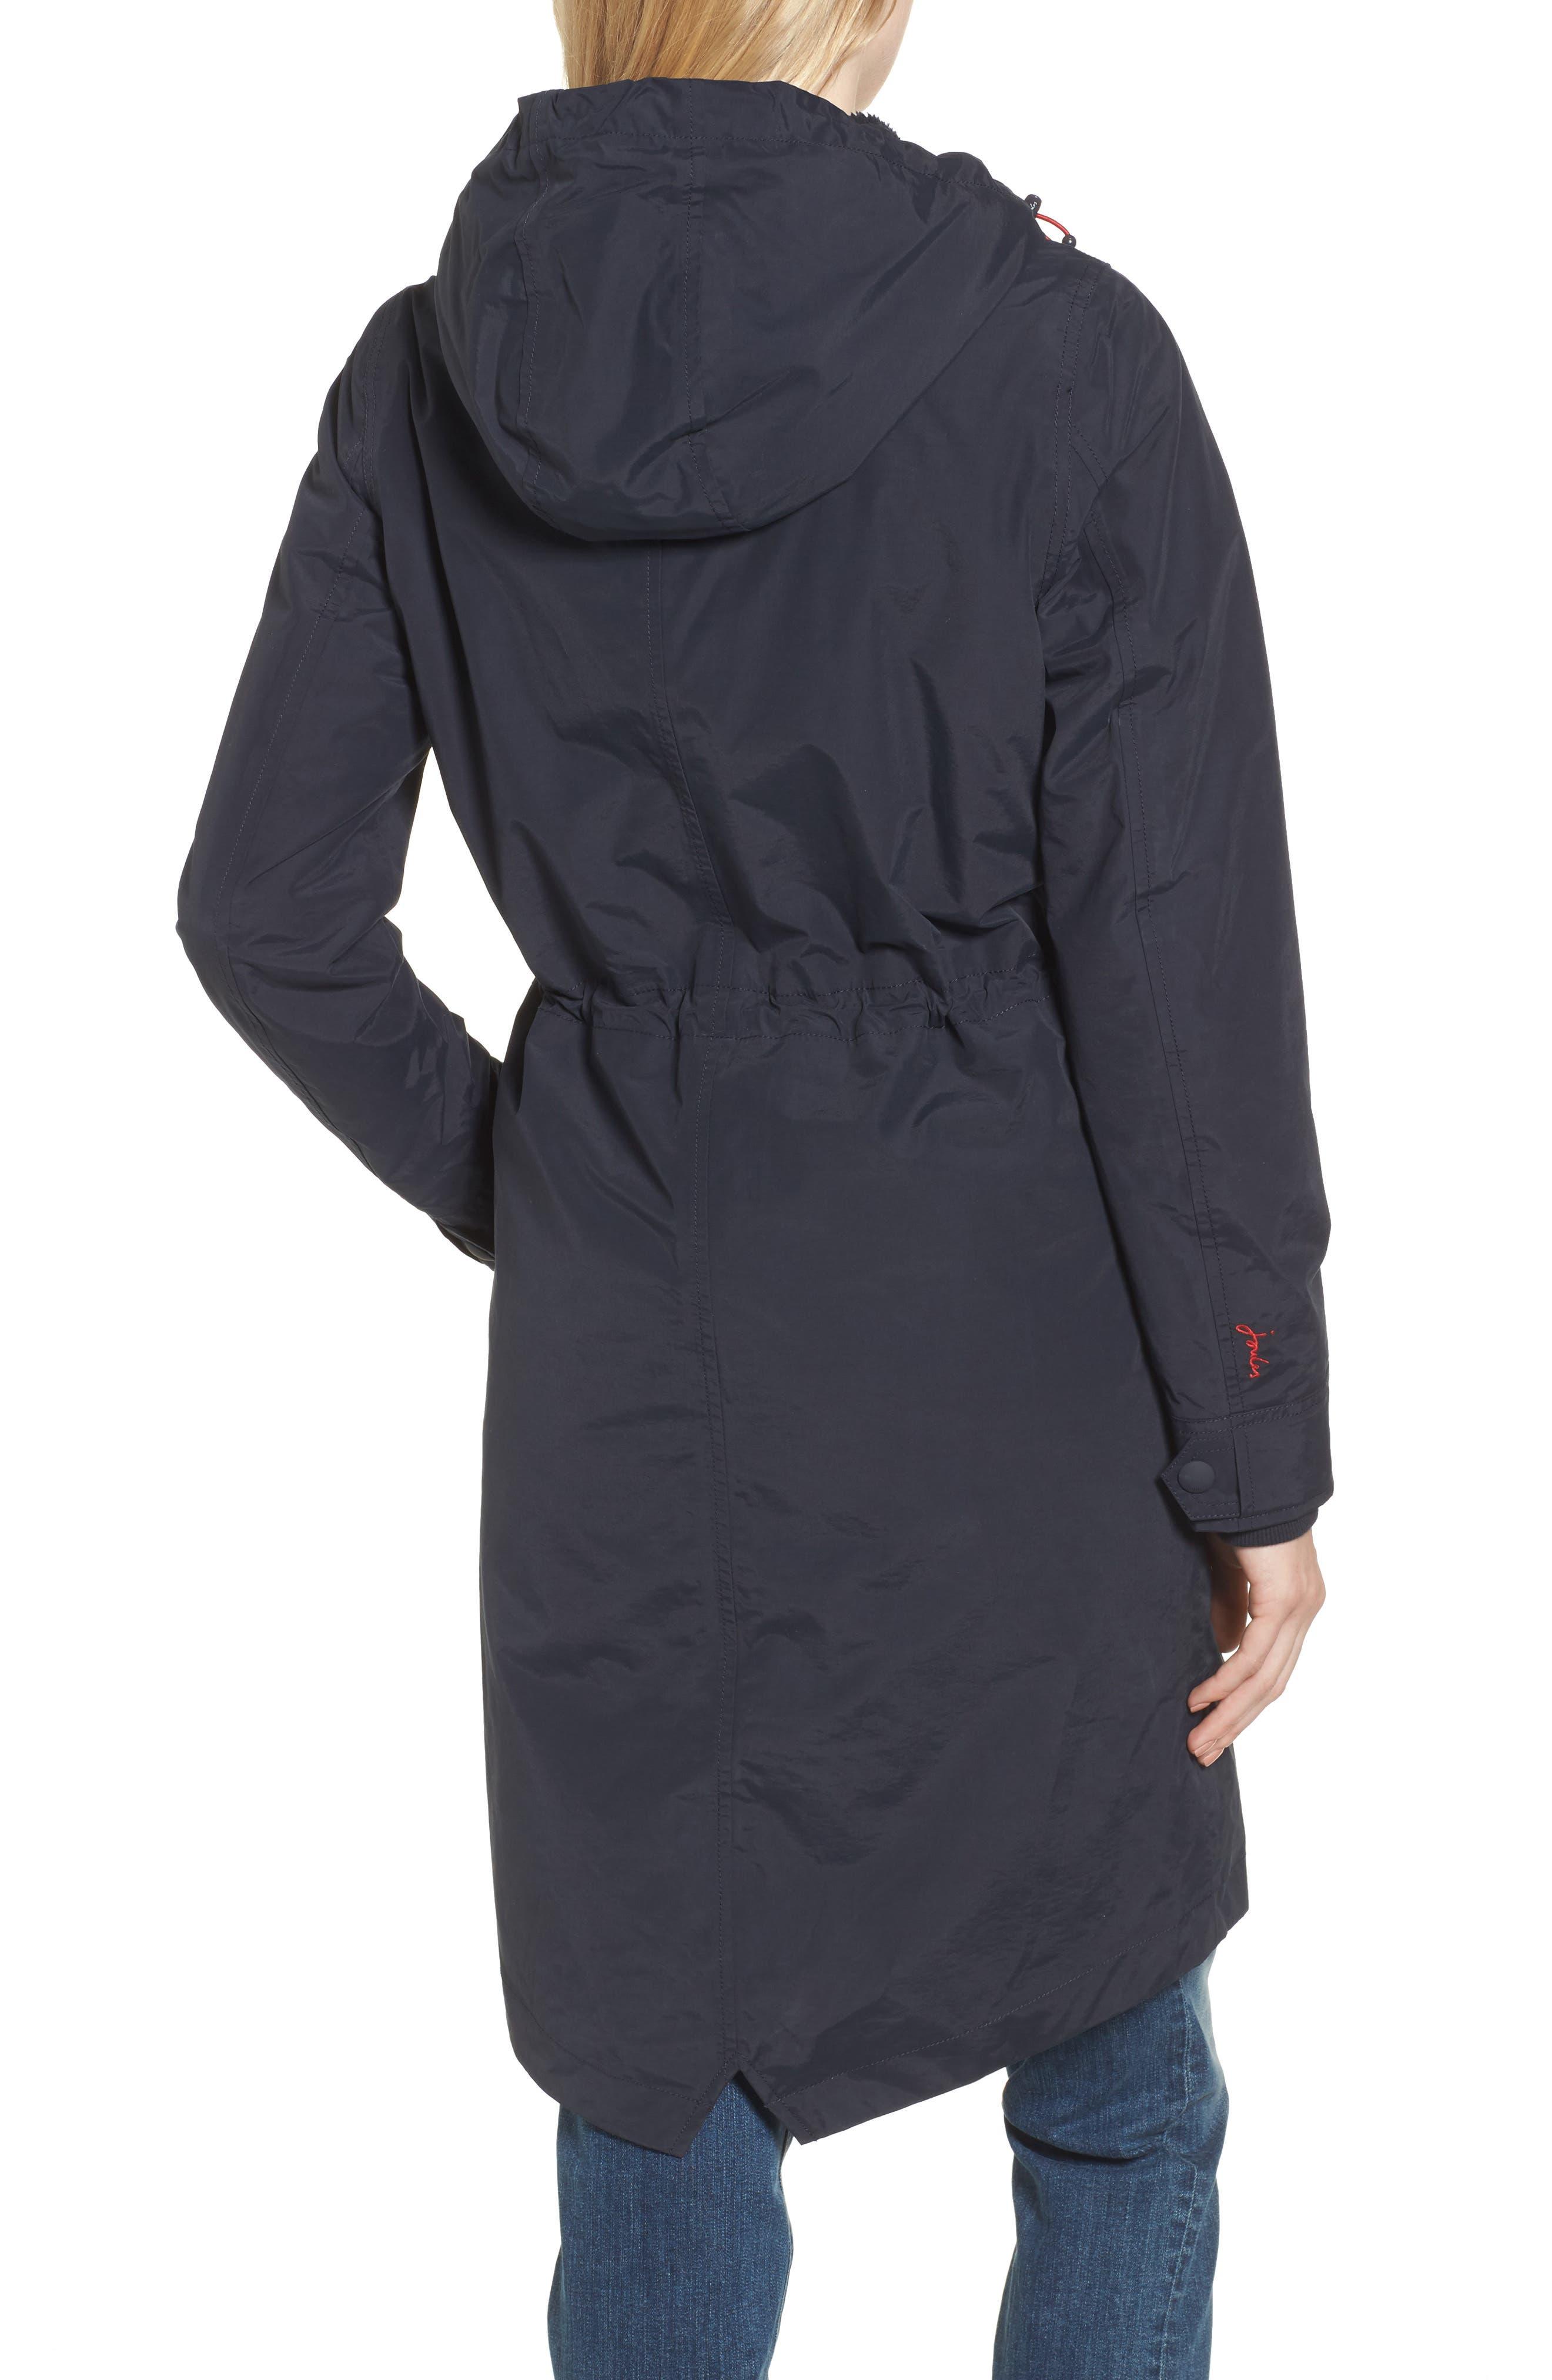 Hooded Fleece Lined Raincoat,                             Alternate thumbnail 2, color,                             Marine Navy